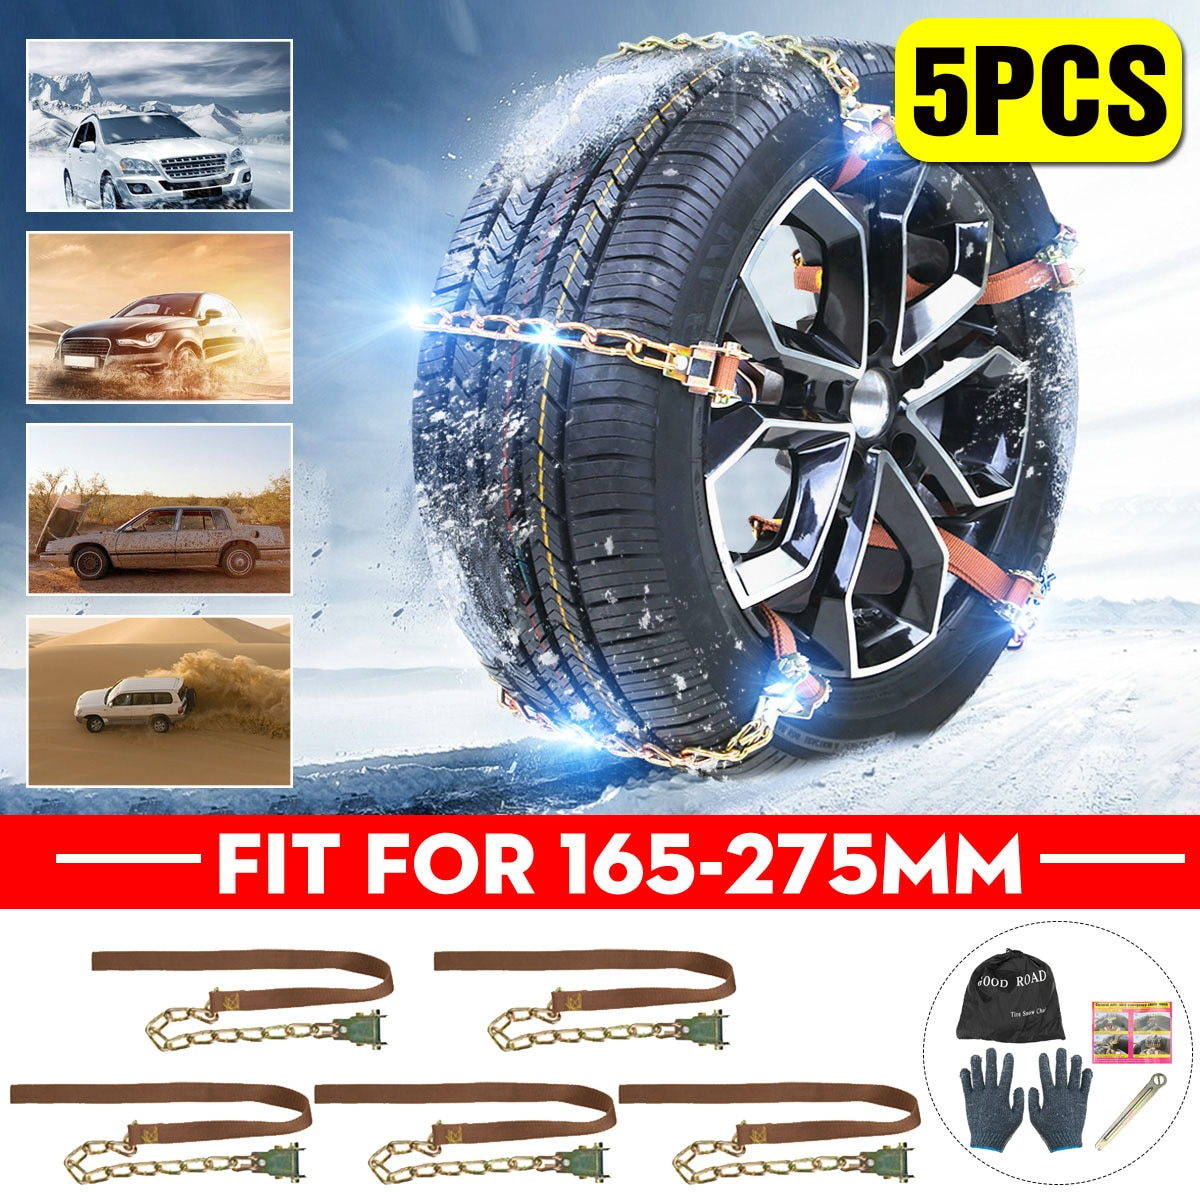 5PCS Car Truck Tire Snow Chains Winter Wheel Belt Mud Sand Roadway Safety Adjustable Wear-resistant Anti-Skid Snow Chains